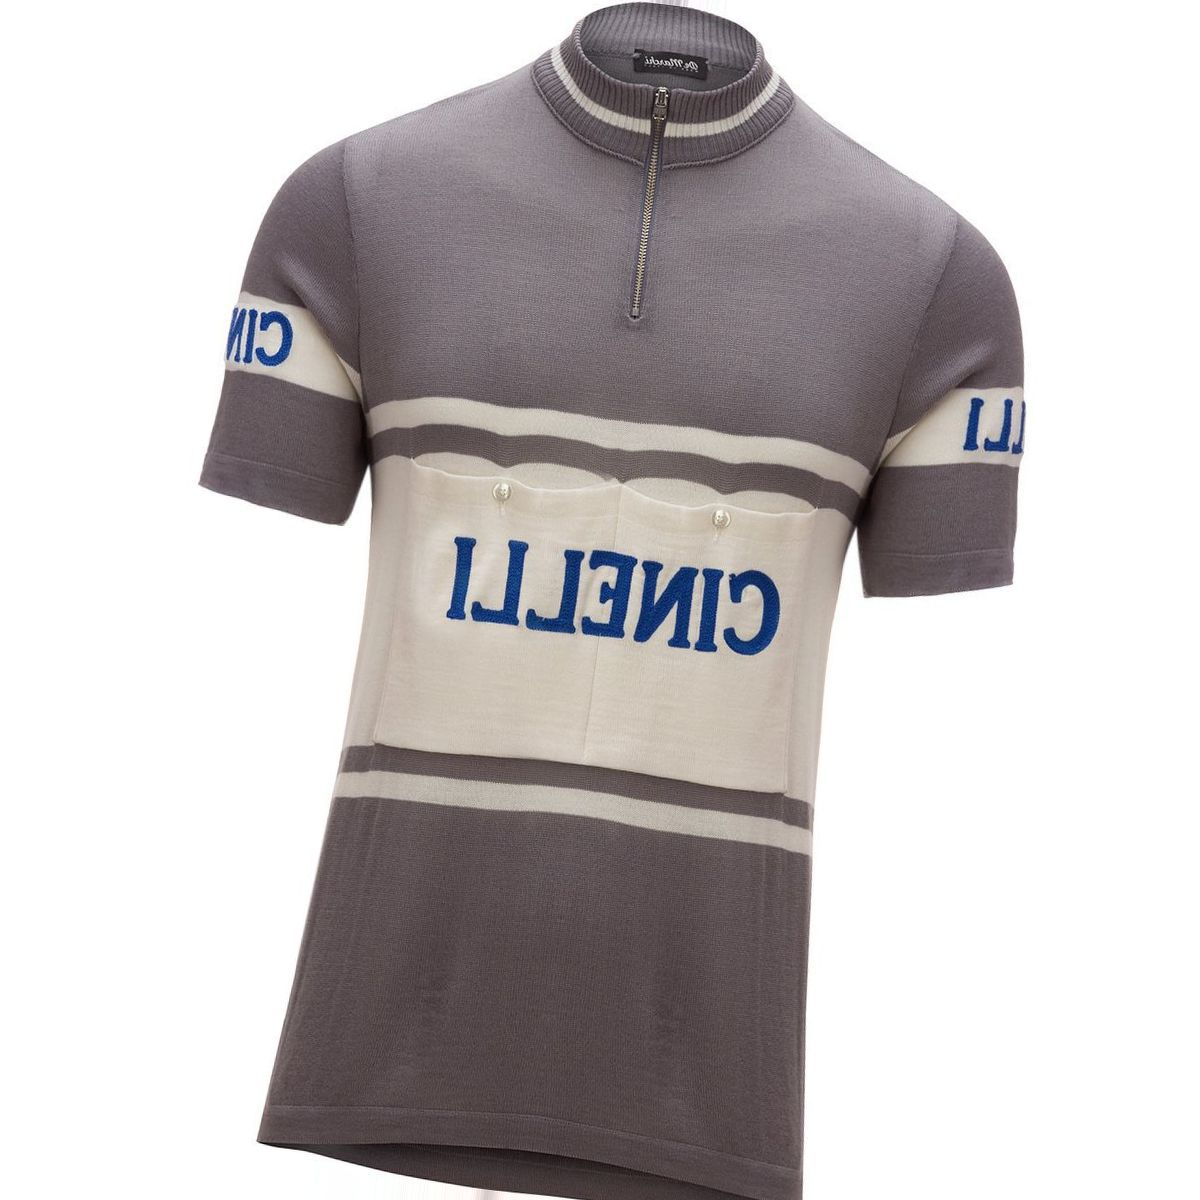 De Marchi Cinelli 1970 Merino Short-Sleeve Jersey - Men's